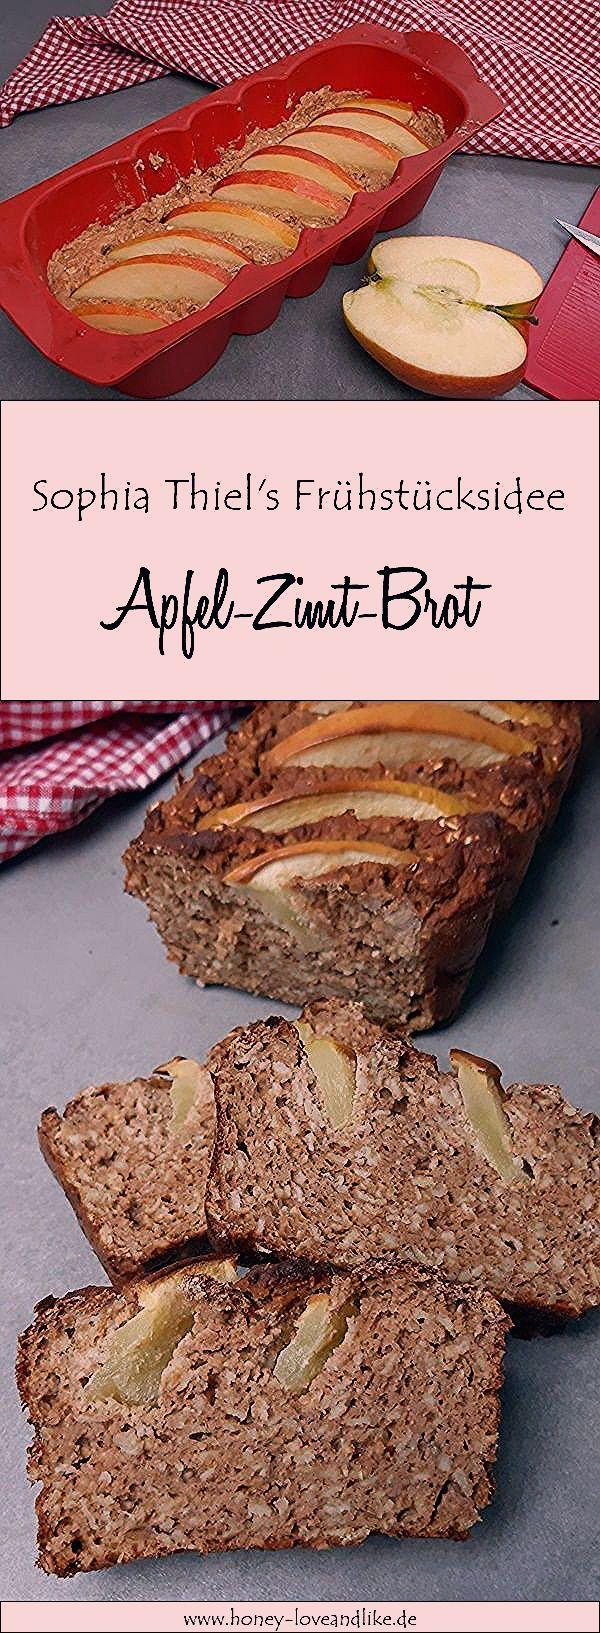 Photo of Apfel-Zimt-Brot nach Sophia Thiel